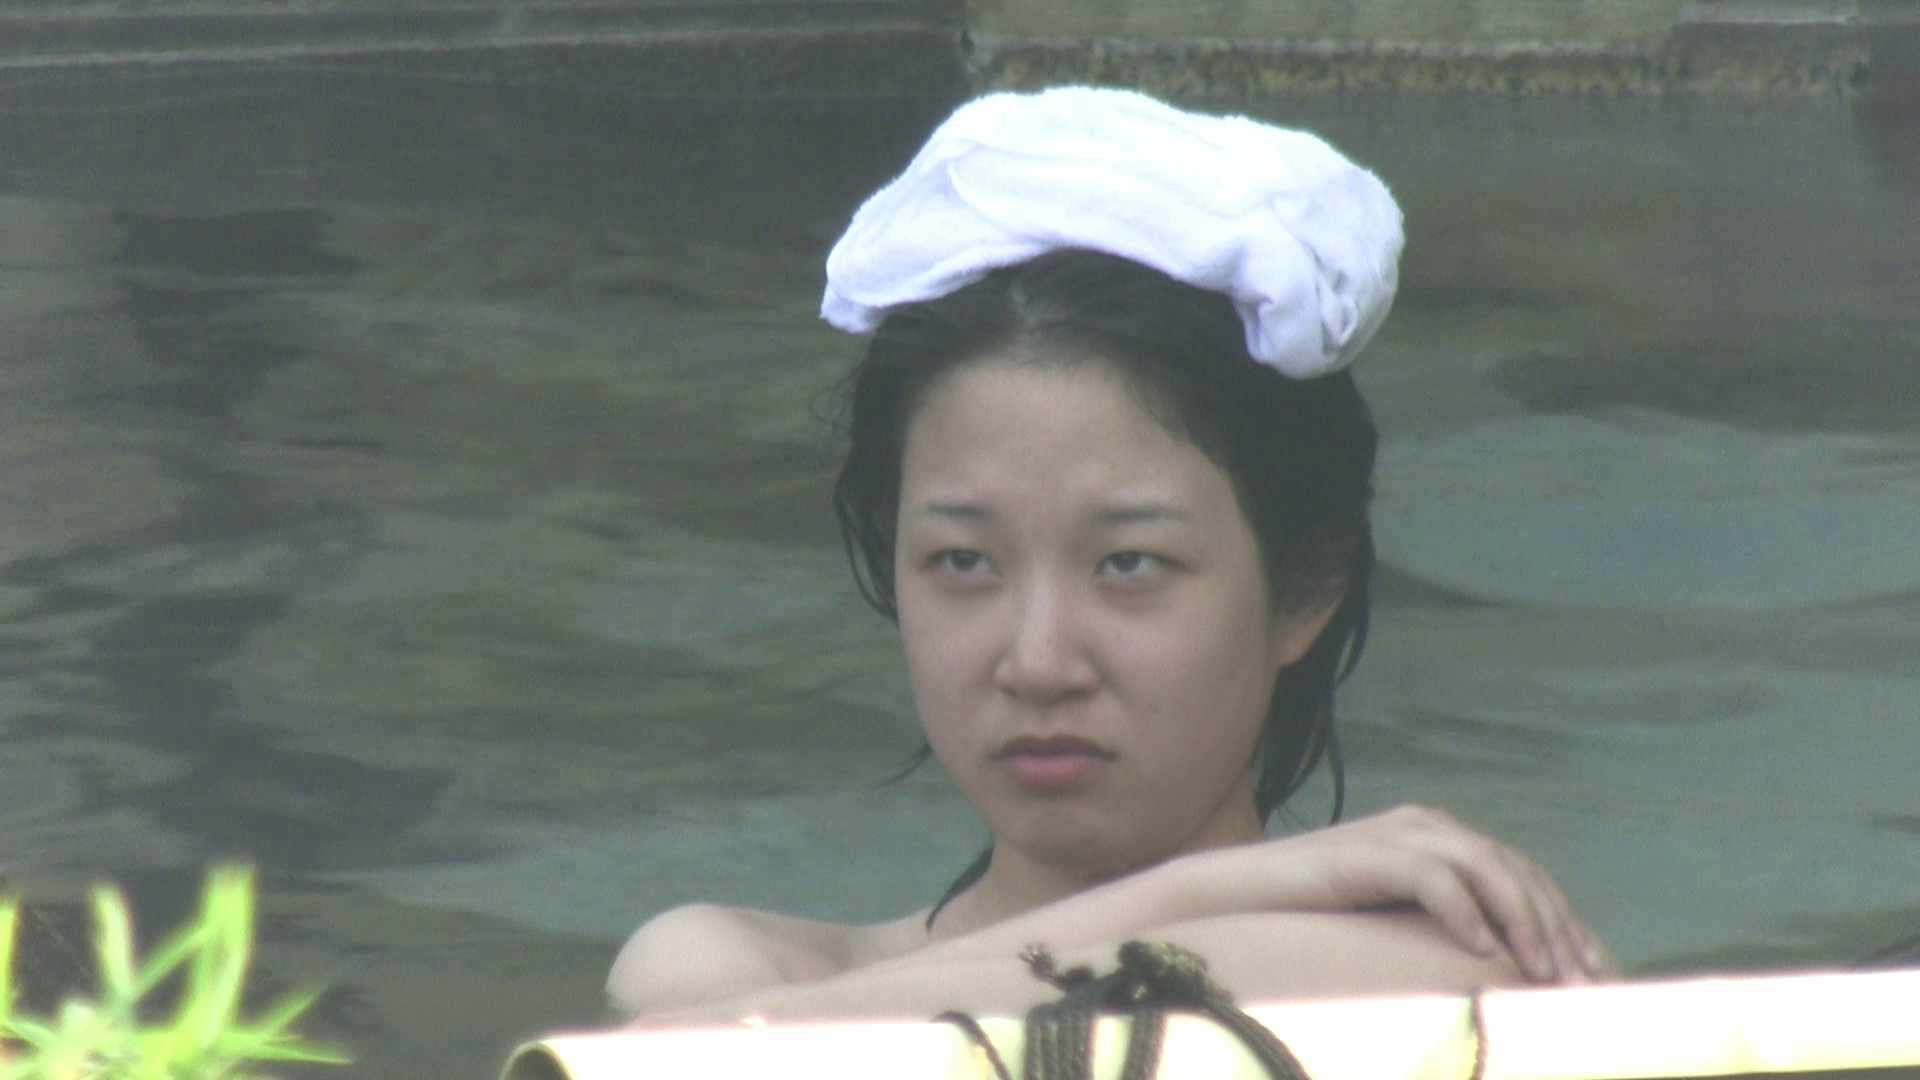 Aquaな露天風呂Vol.172 盗撮   HなOL  55pic 40